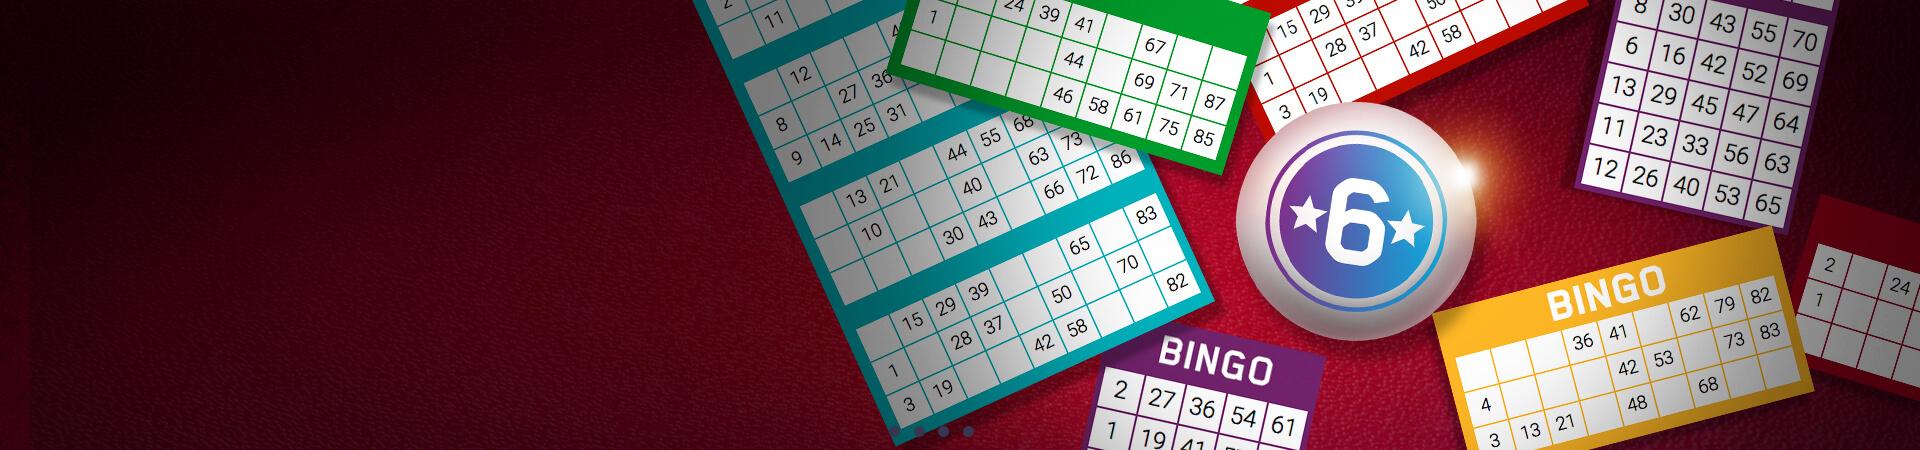 Bingo Mobil2